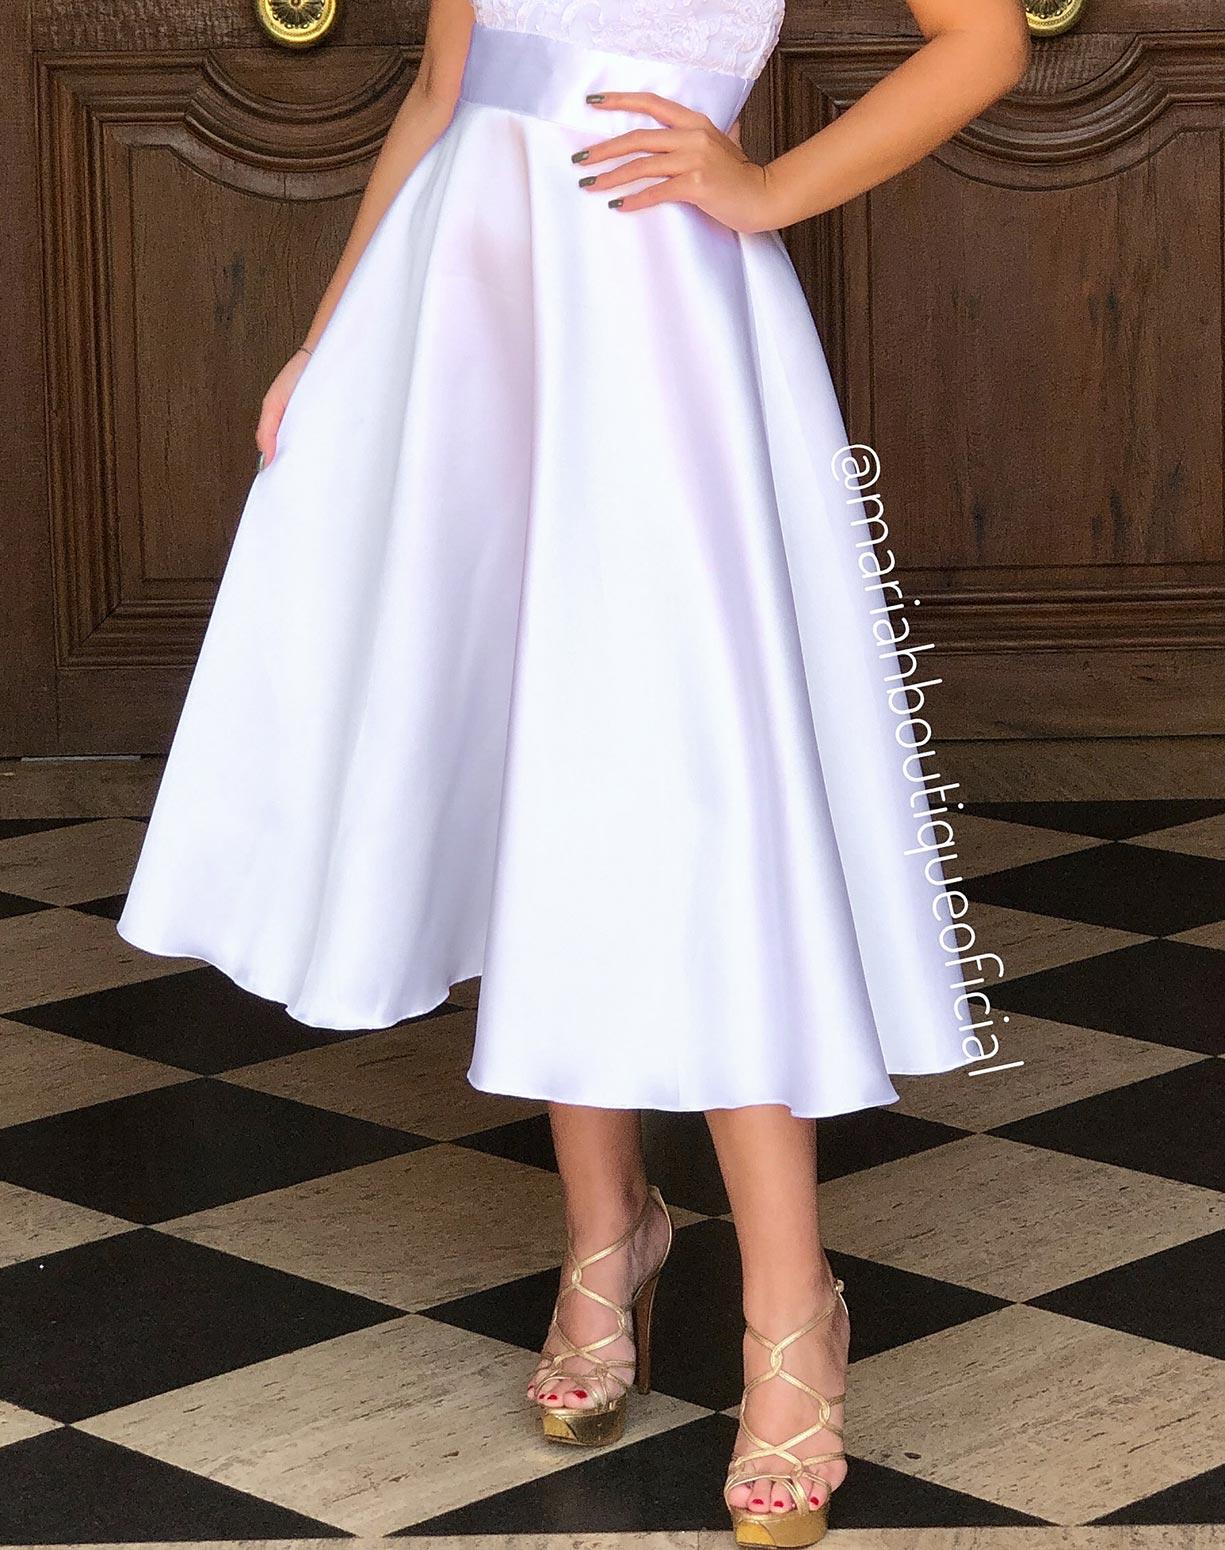 Vestido Branco Midi com Corpo em Renda e Saia em Zibeline